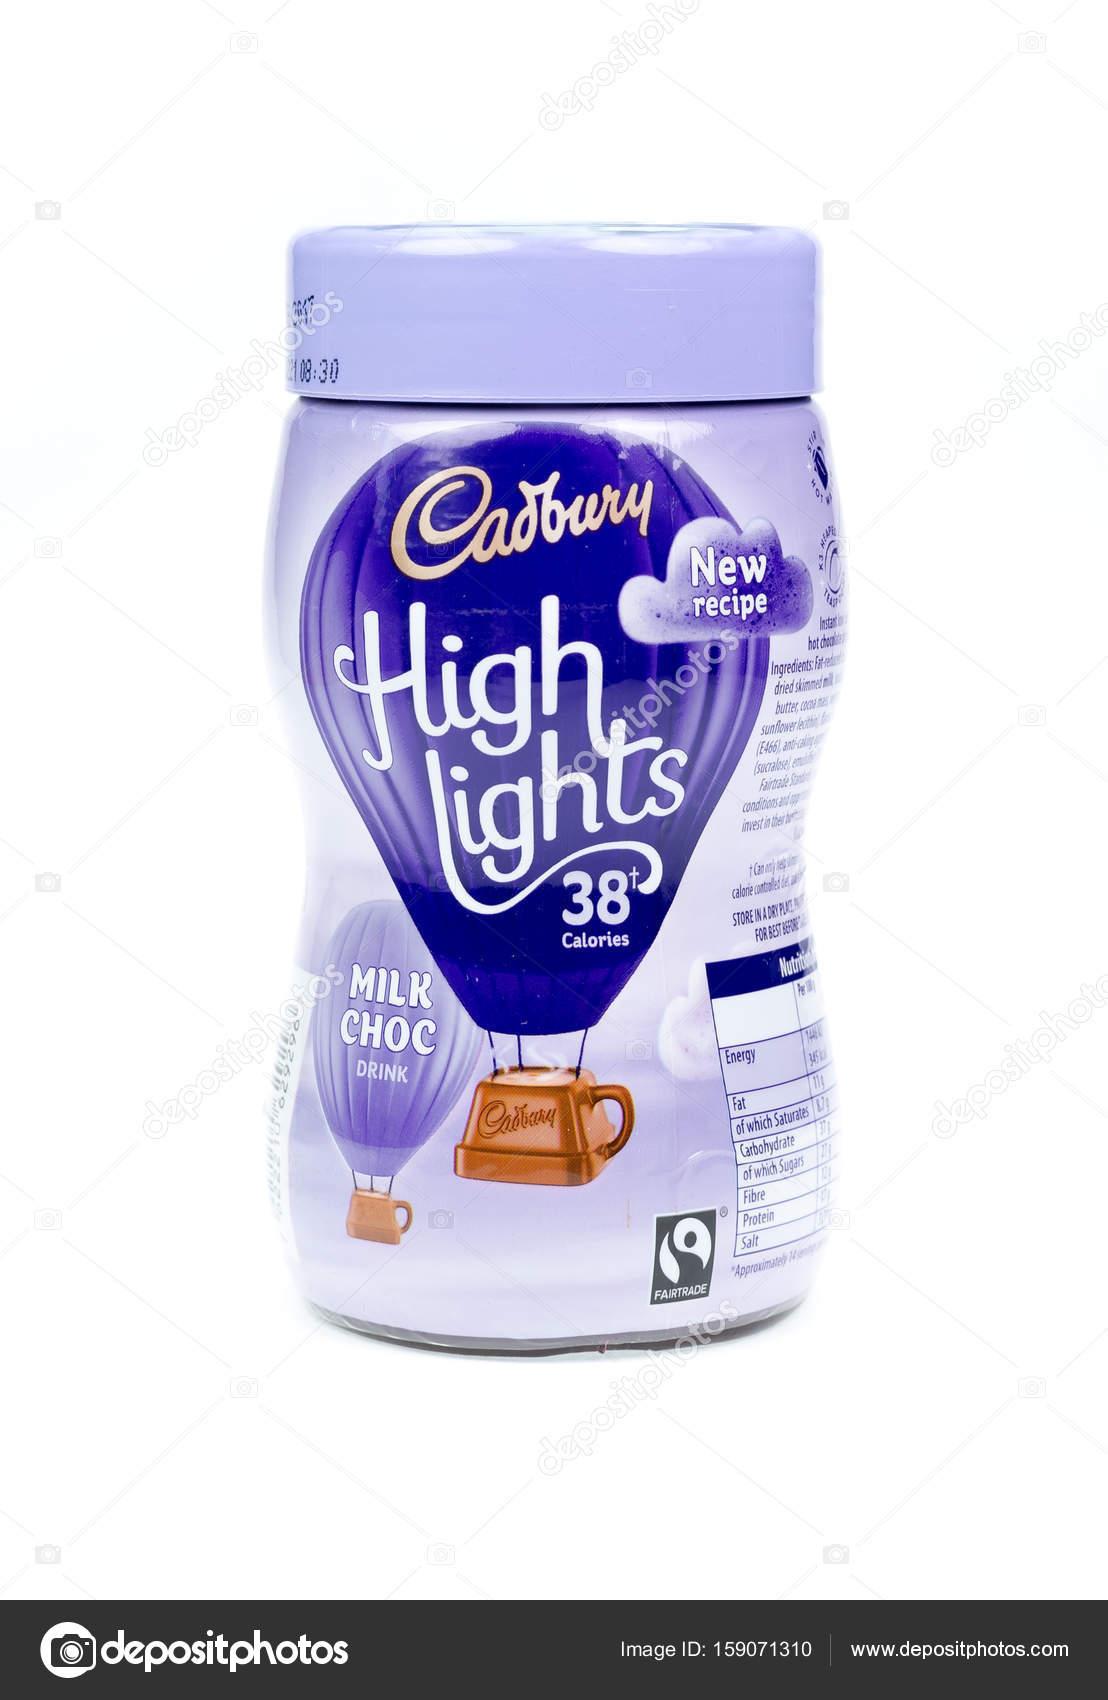 Cadburys Highlights Milk Choc Chocolate Drink White